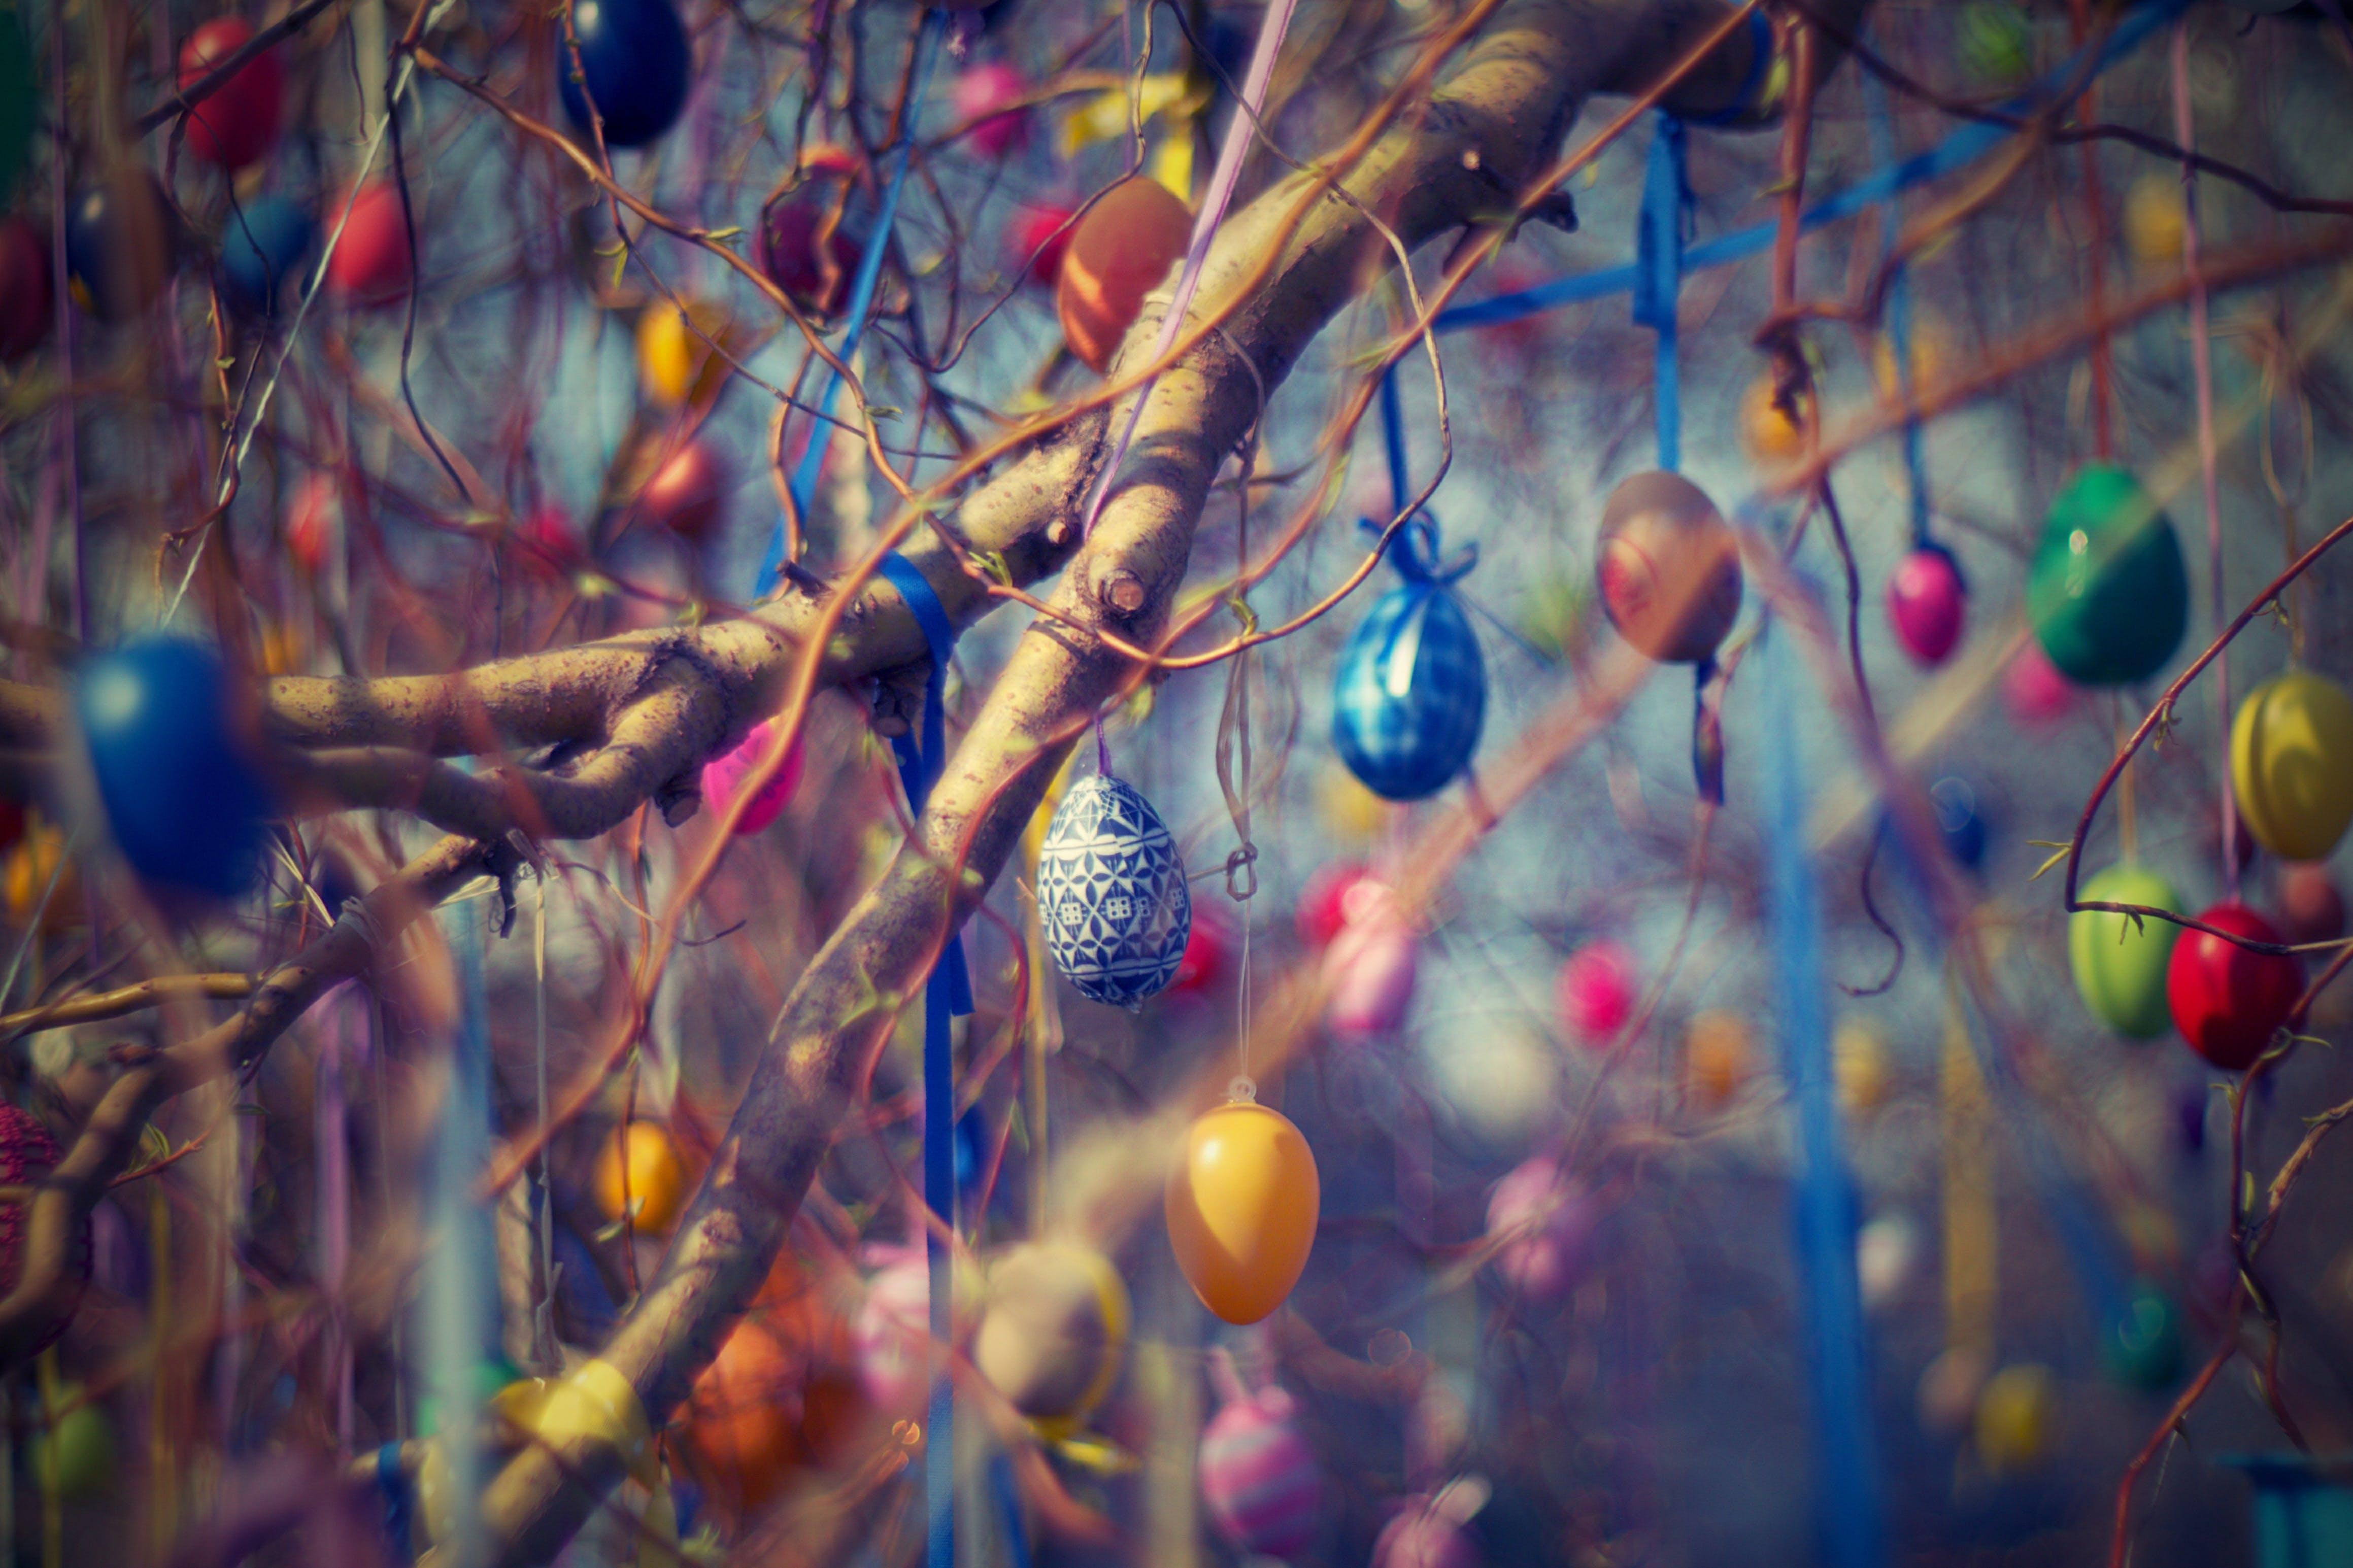 art, blur, branches